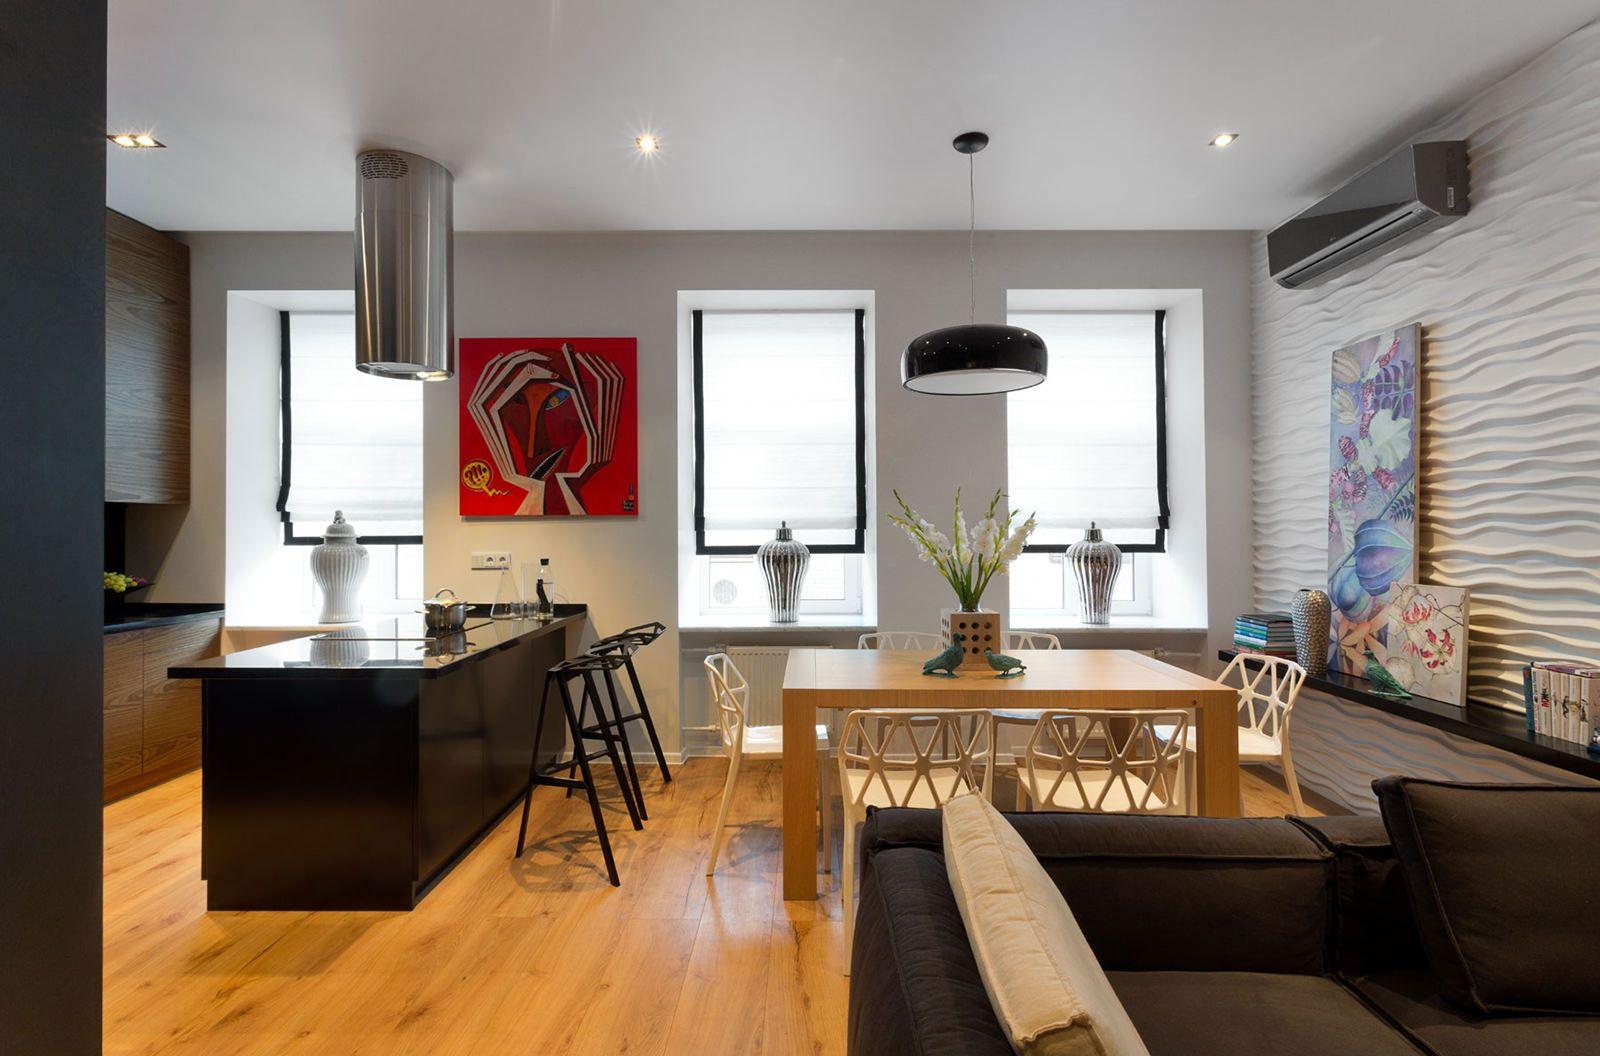 Explore Apartment Interior Design Pandas And More Also Moderen Dizain Za  Tristaen Apartament Home Decor Pinterest